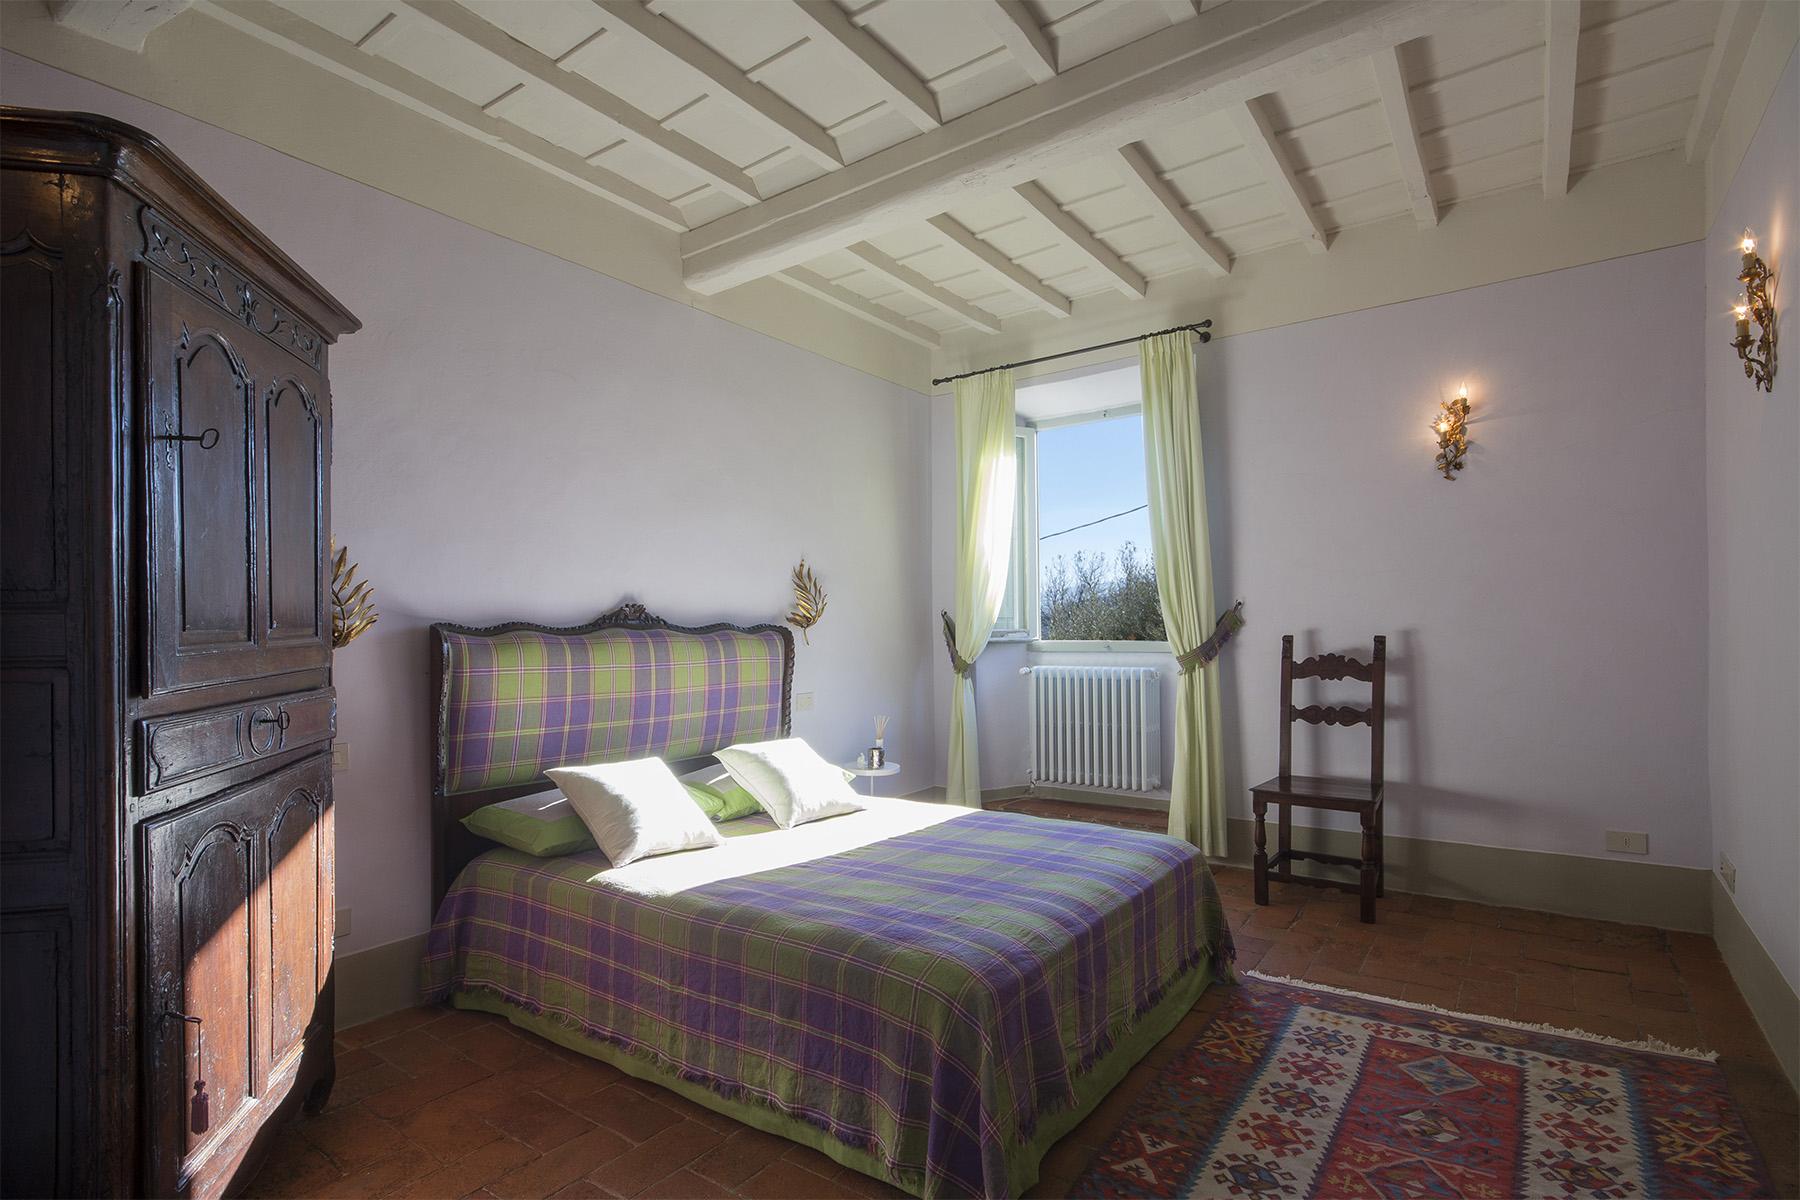 Villa in Affitto a Impruneta: 5 locali, 560 mq - Foto 8